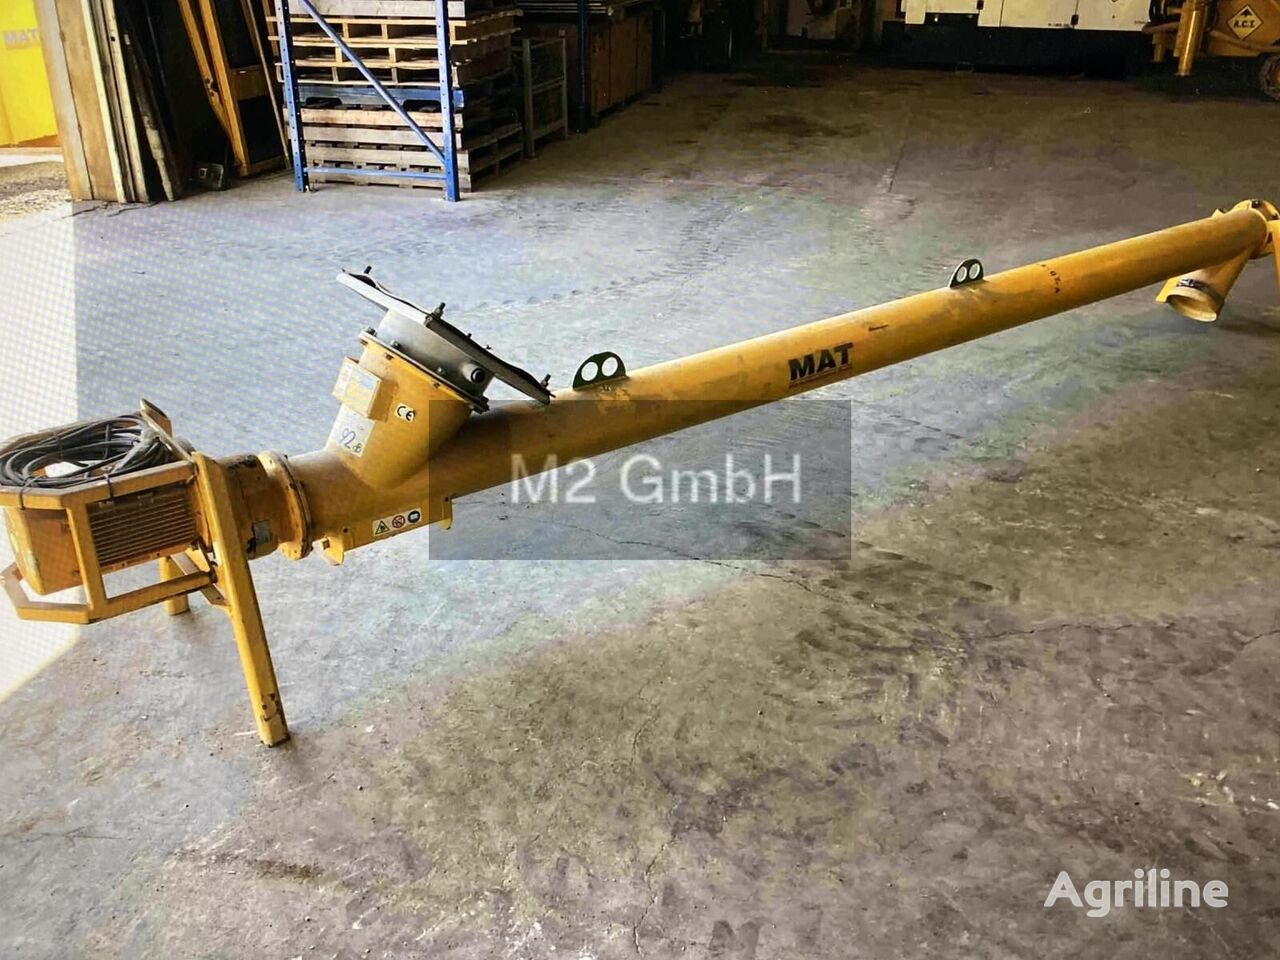 BAUER MAT Förderschnecke FS 193/4000 grain thrower